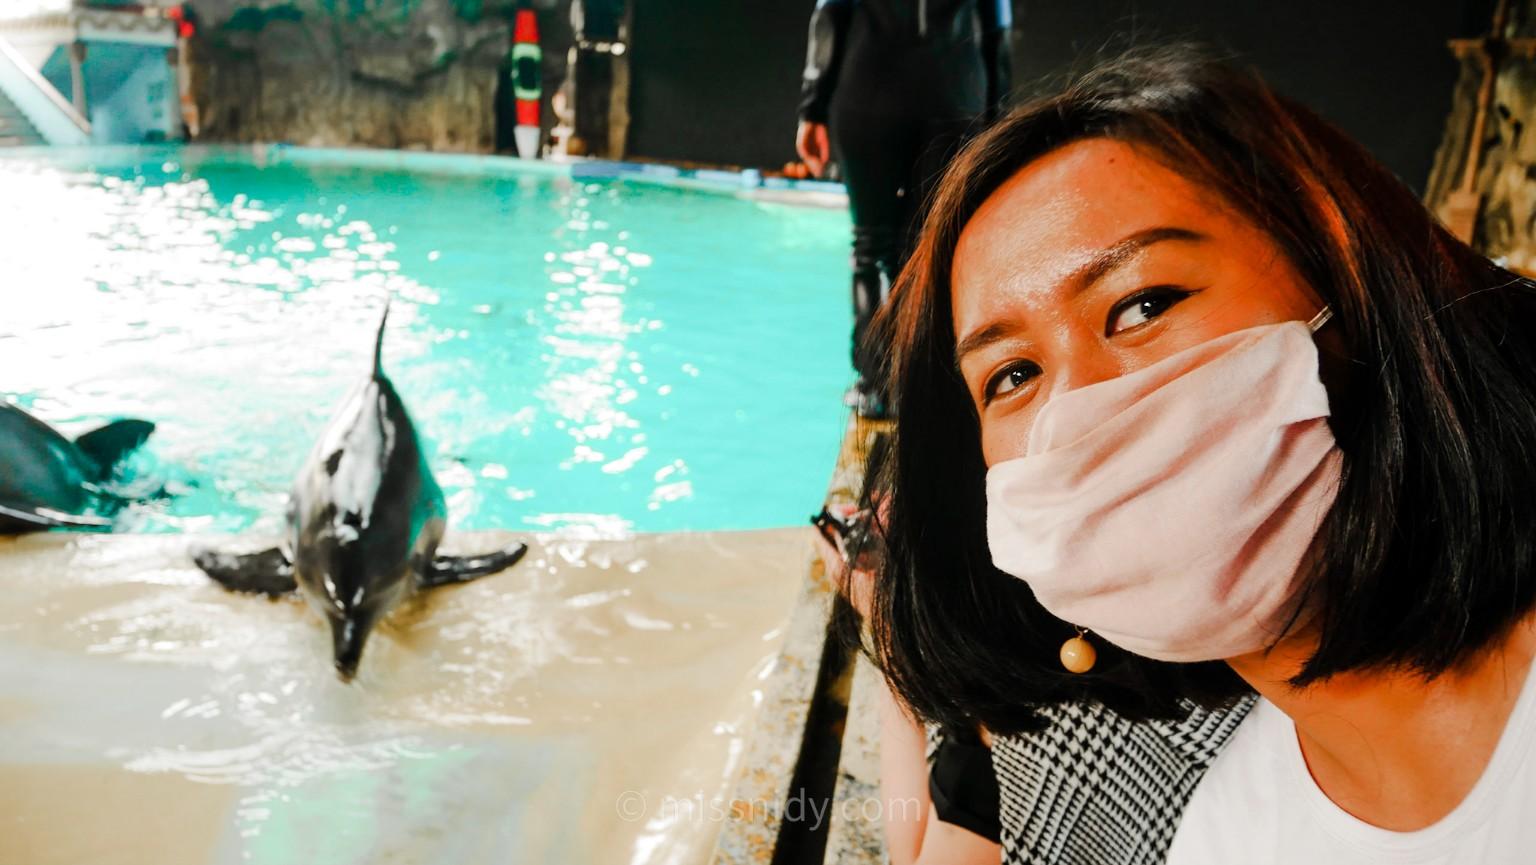 pertunjukan lumba-lumba di ancol